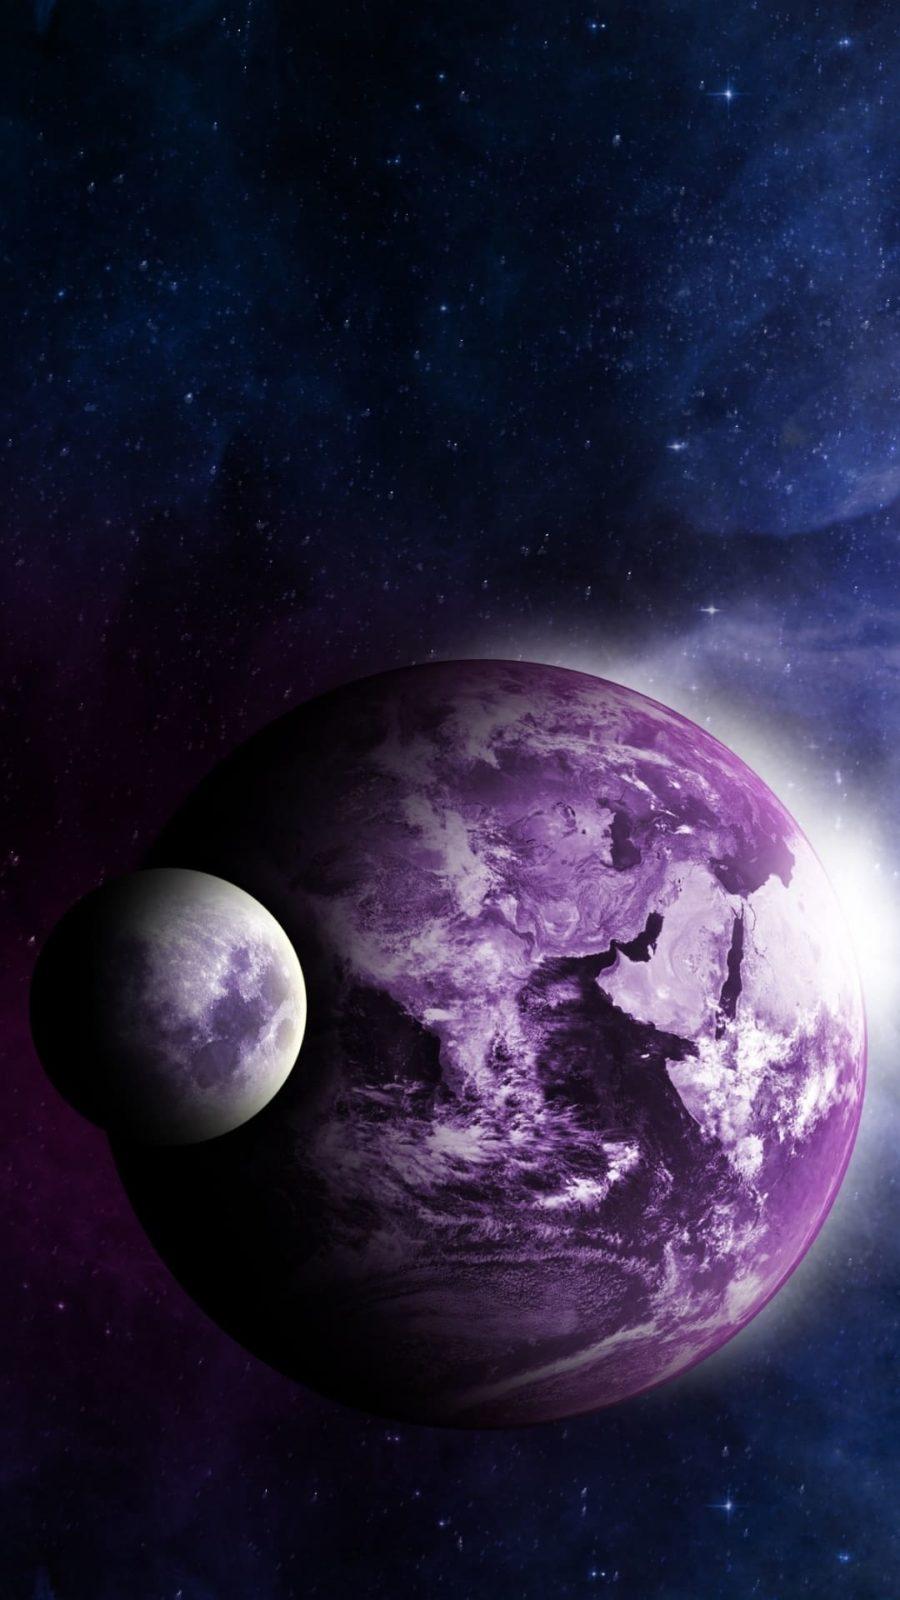 Обои космос на телефон 4